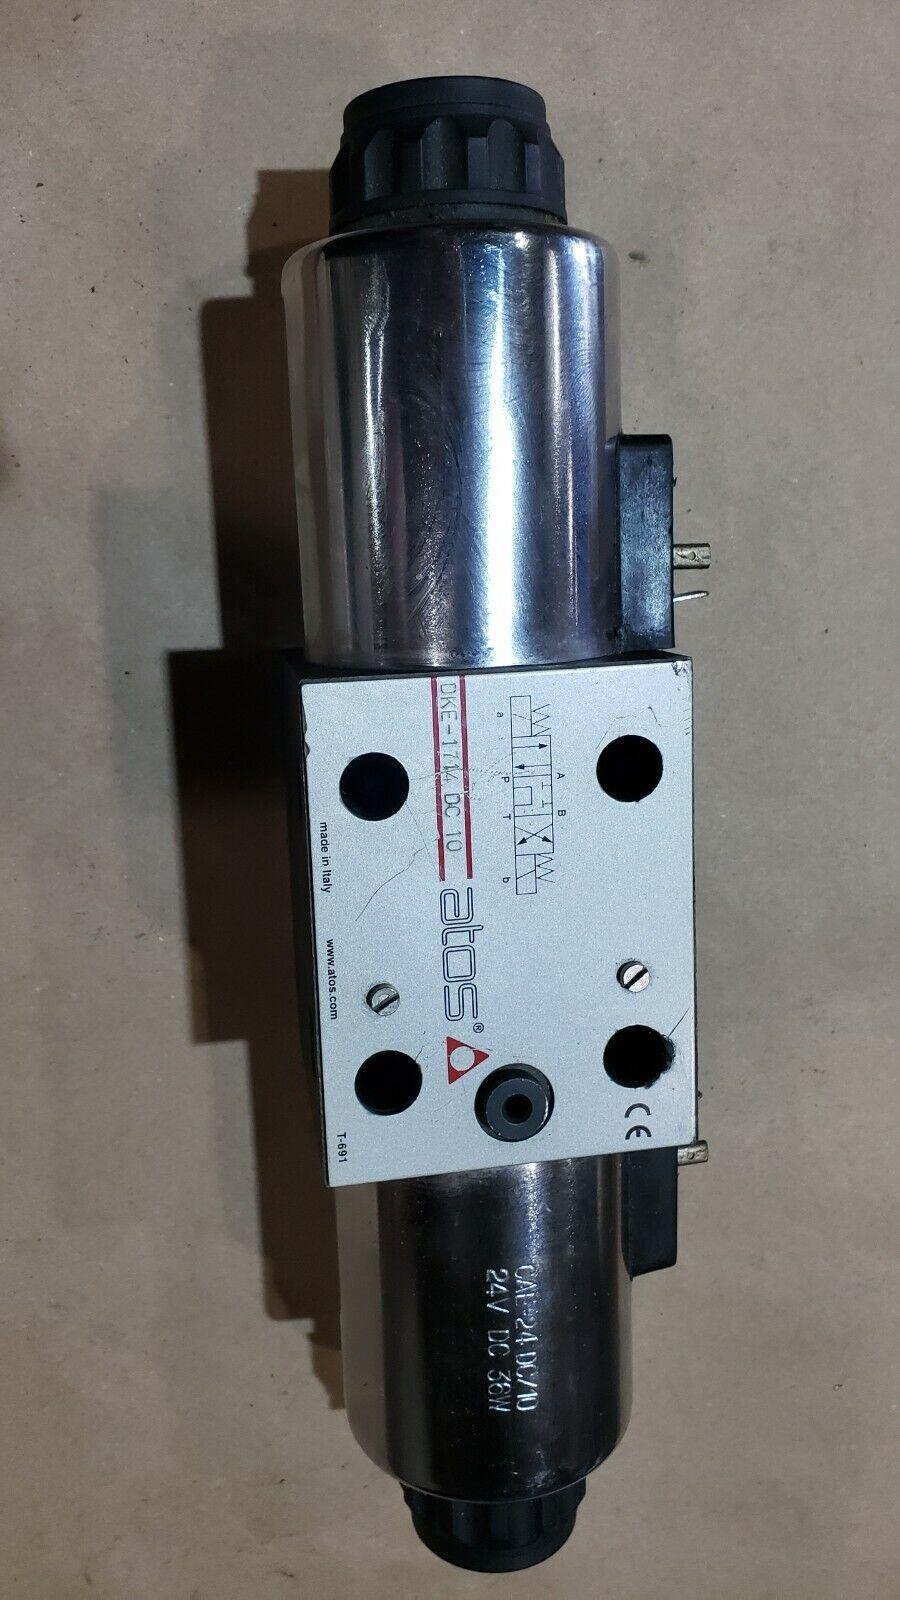 Dhe-0713-00 dc atos imán-caminos-válvula ng06 directional Valve